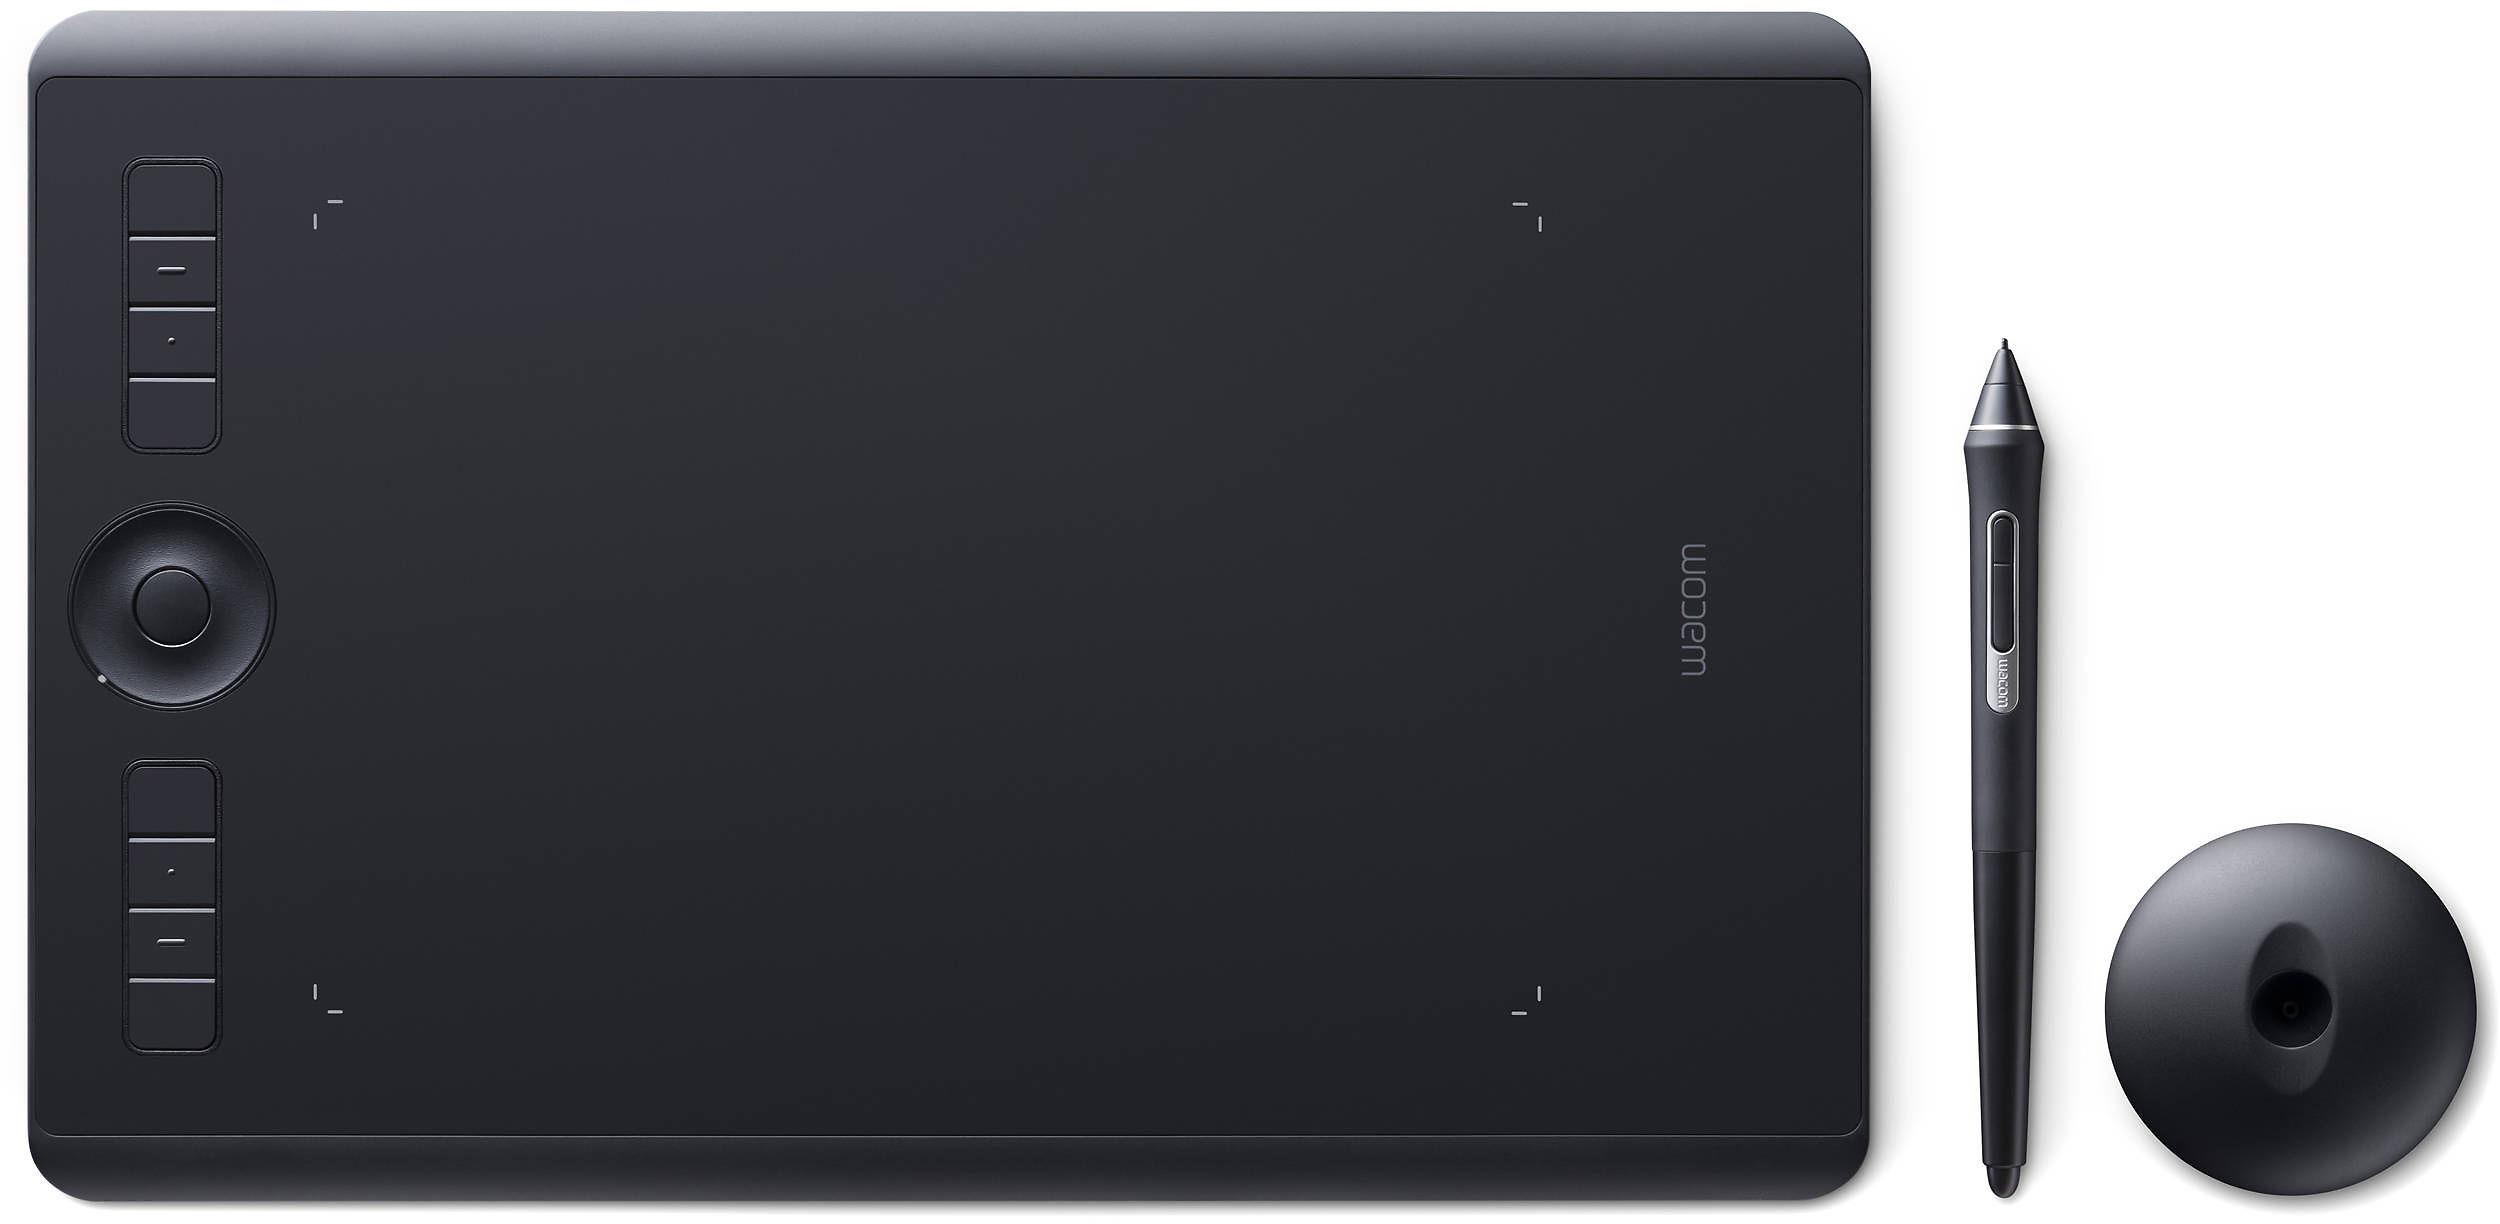 Wacom Intuos Pro Medium Graphics Tablet Master Image